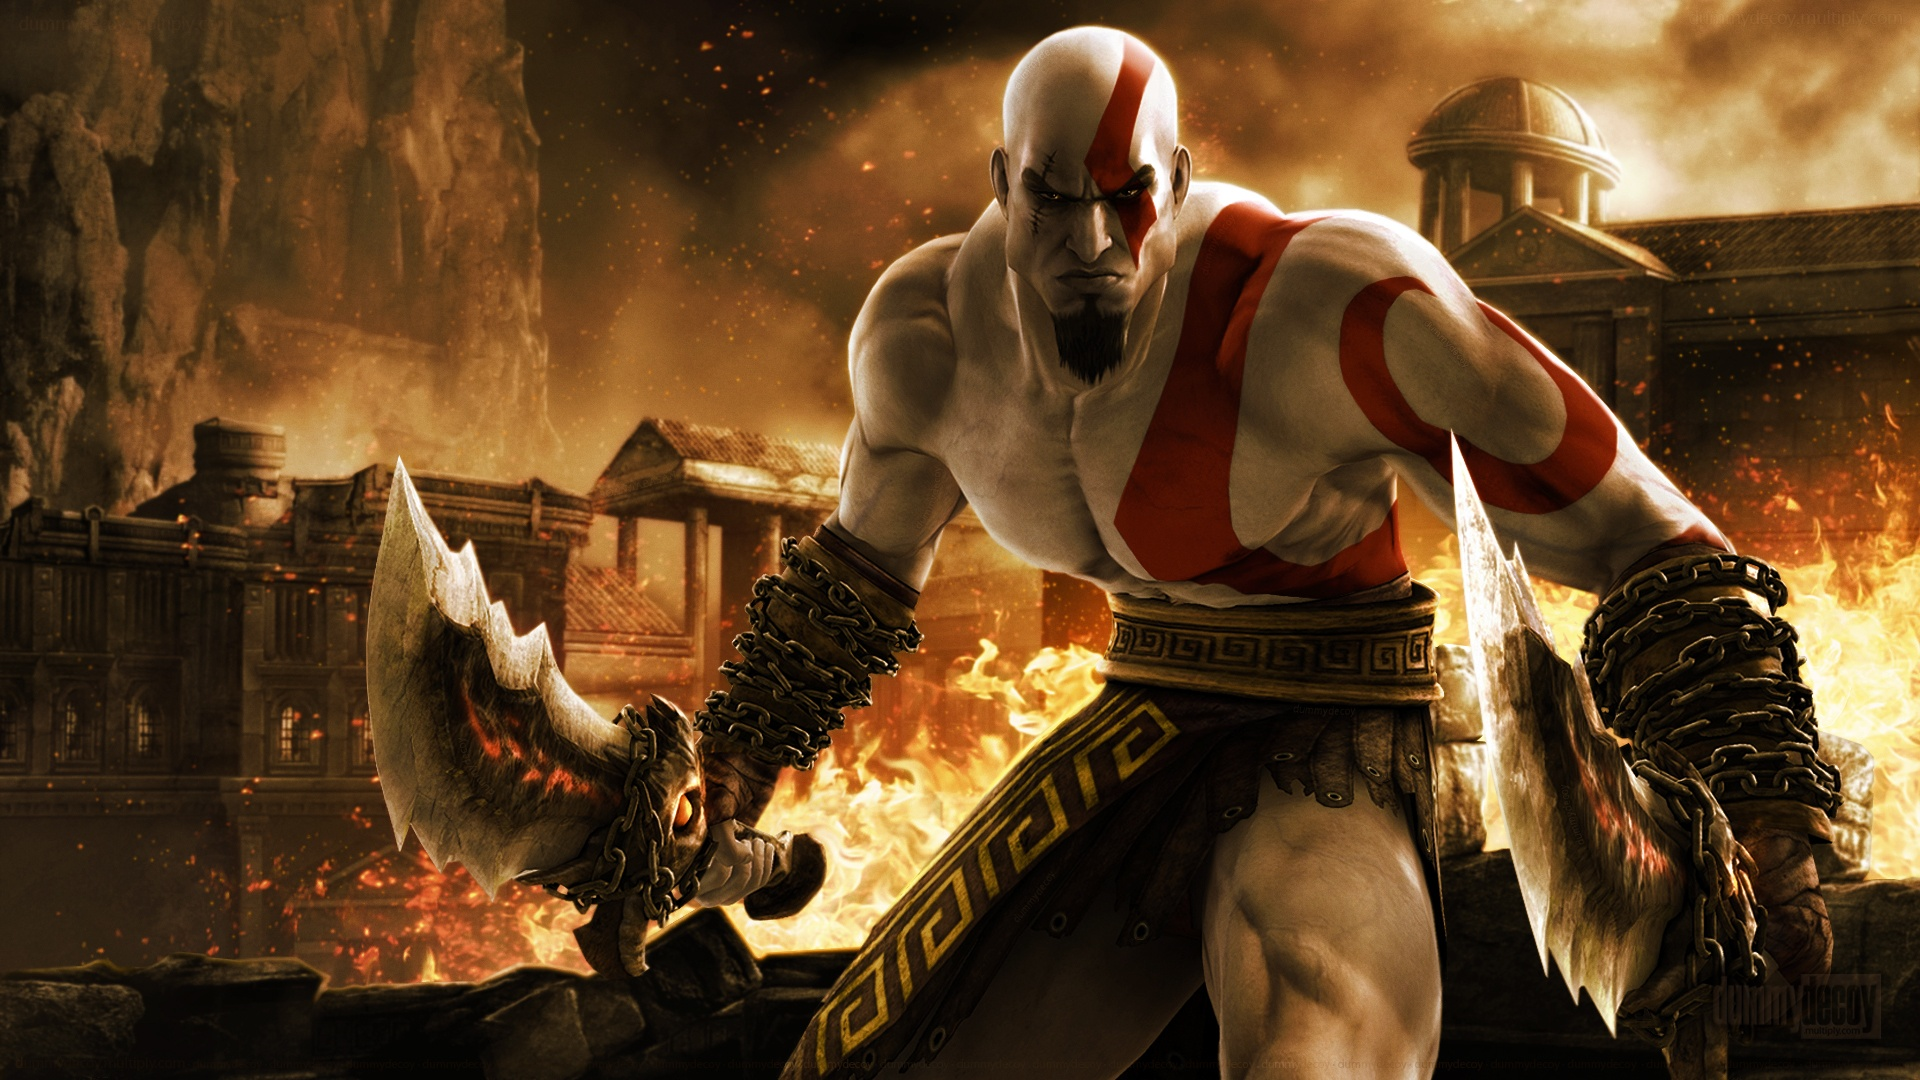 Free Download Kratos In God Of War Games Wallpaper Hd 1920x1080